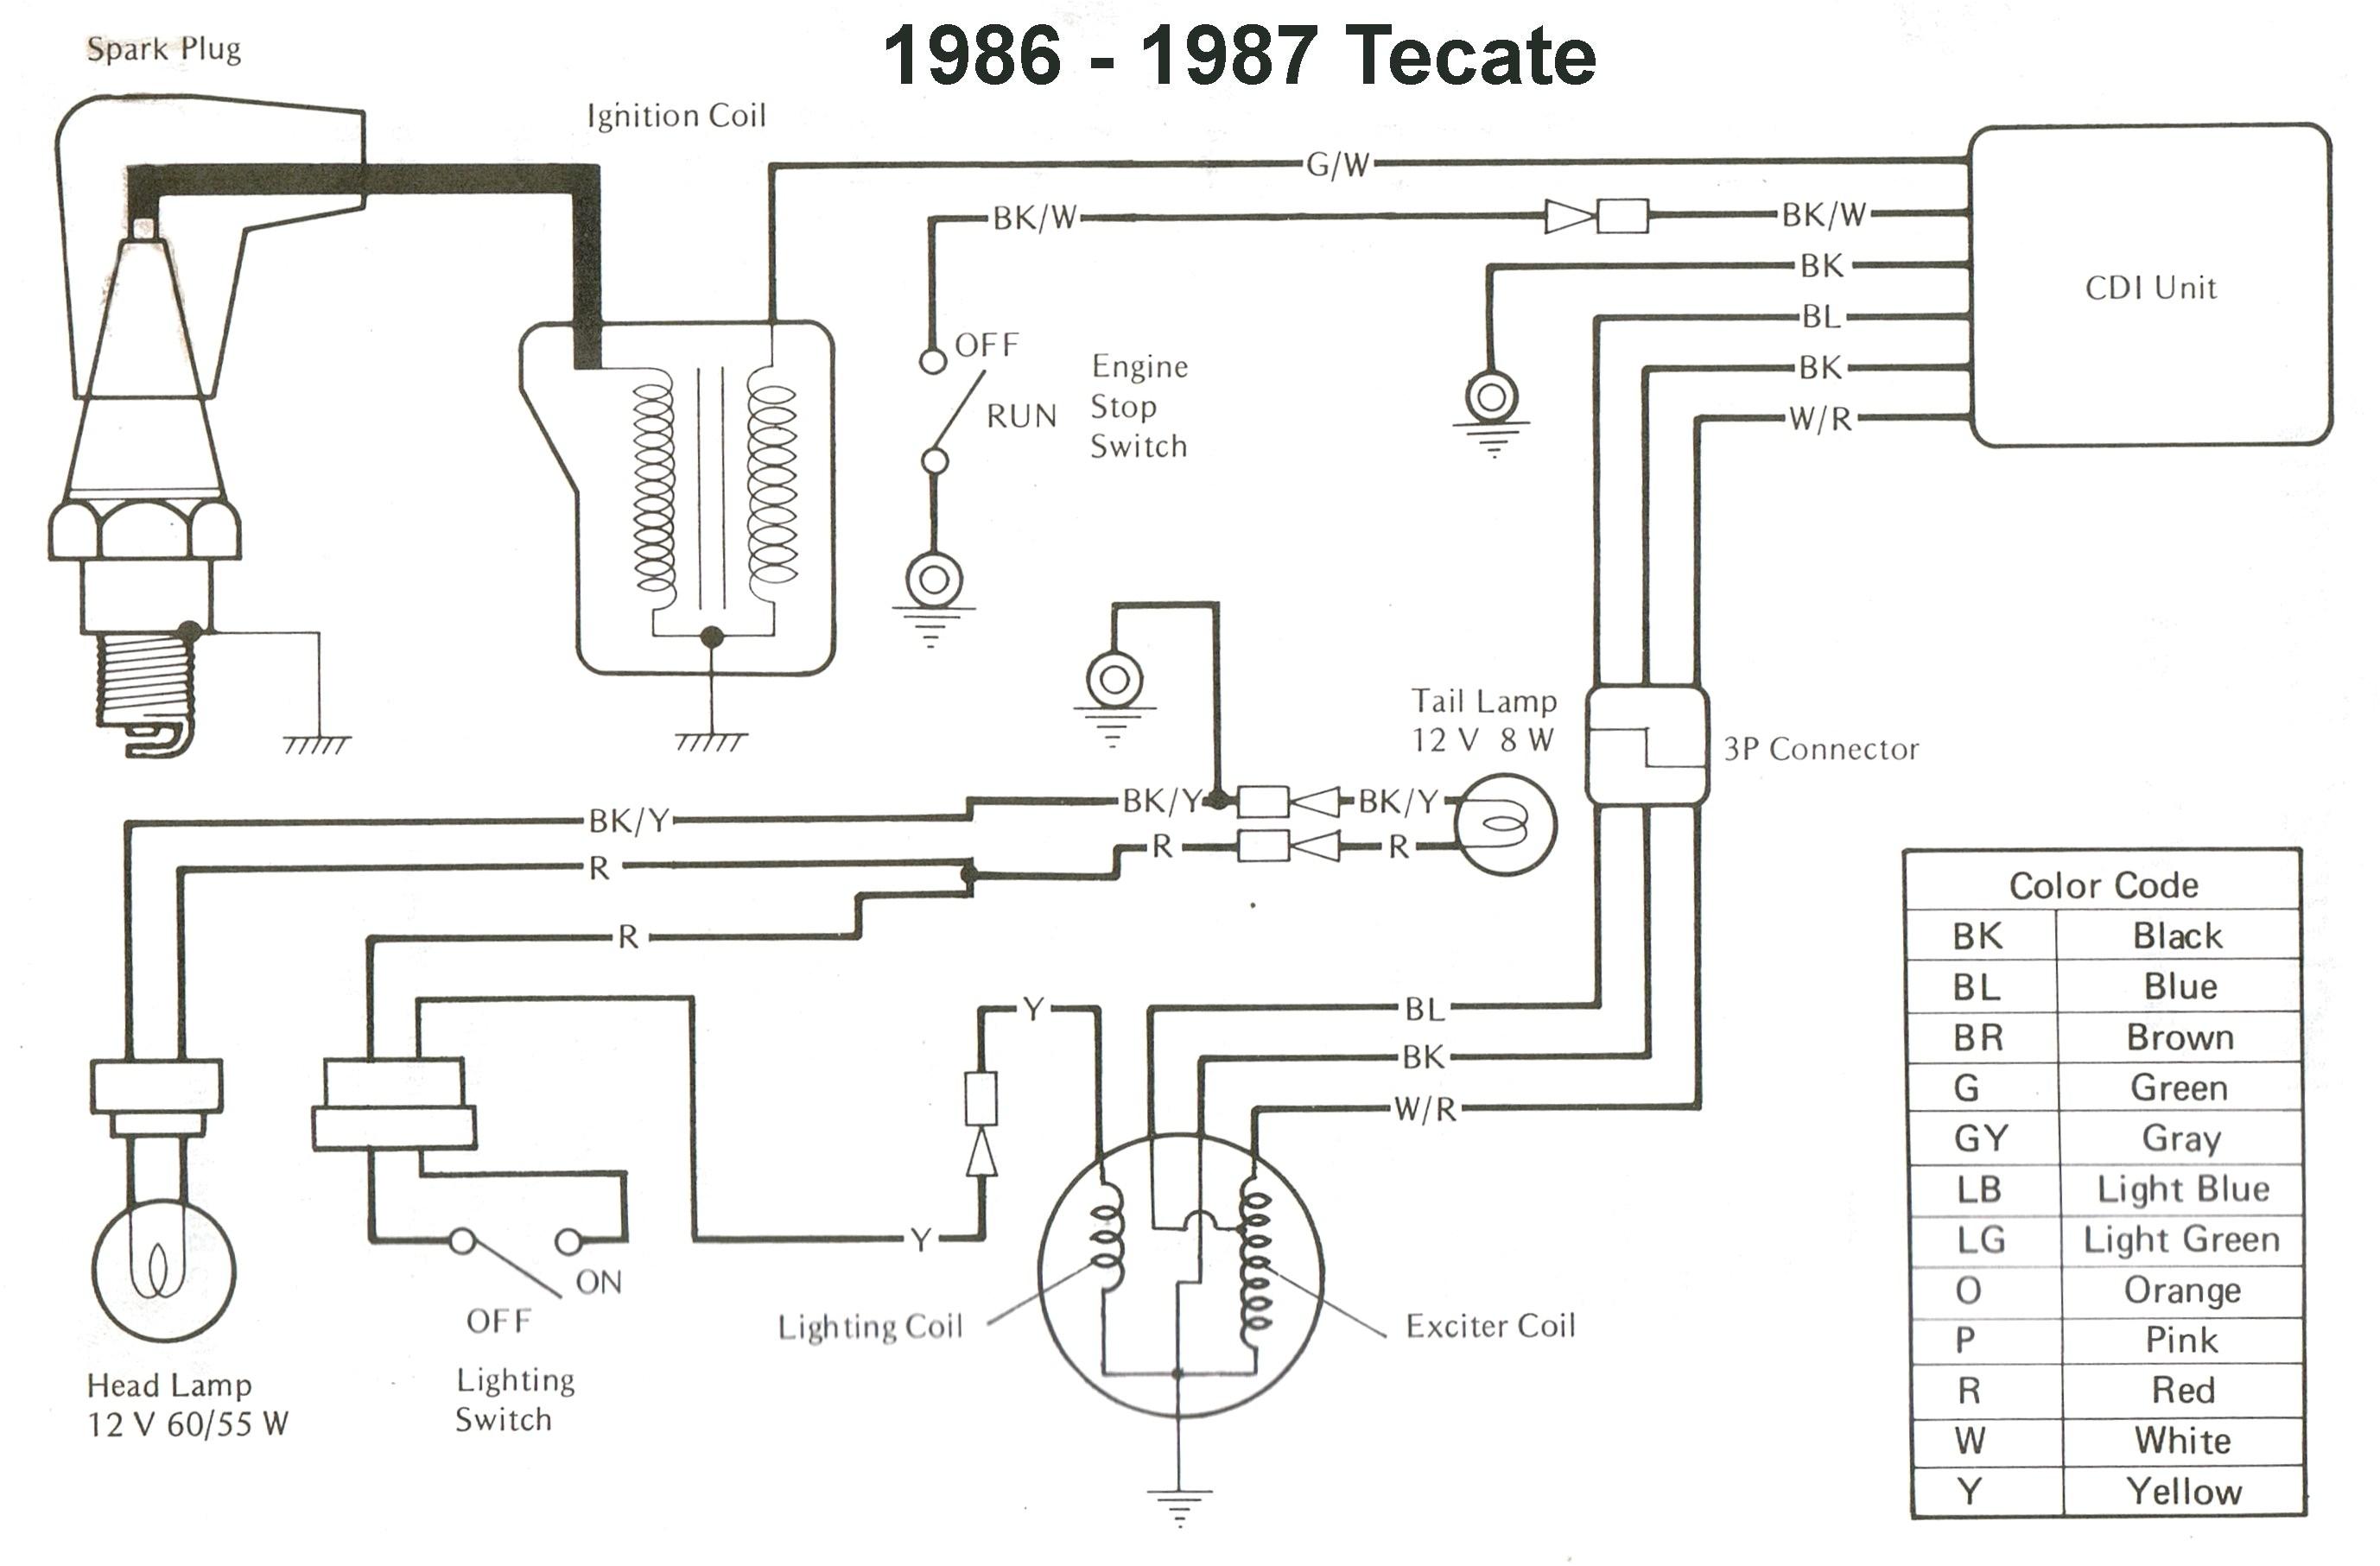 gn250 wire diagram